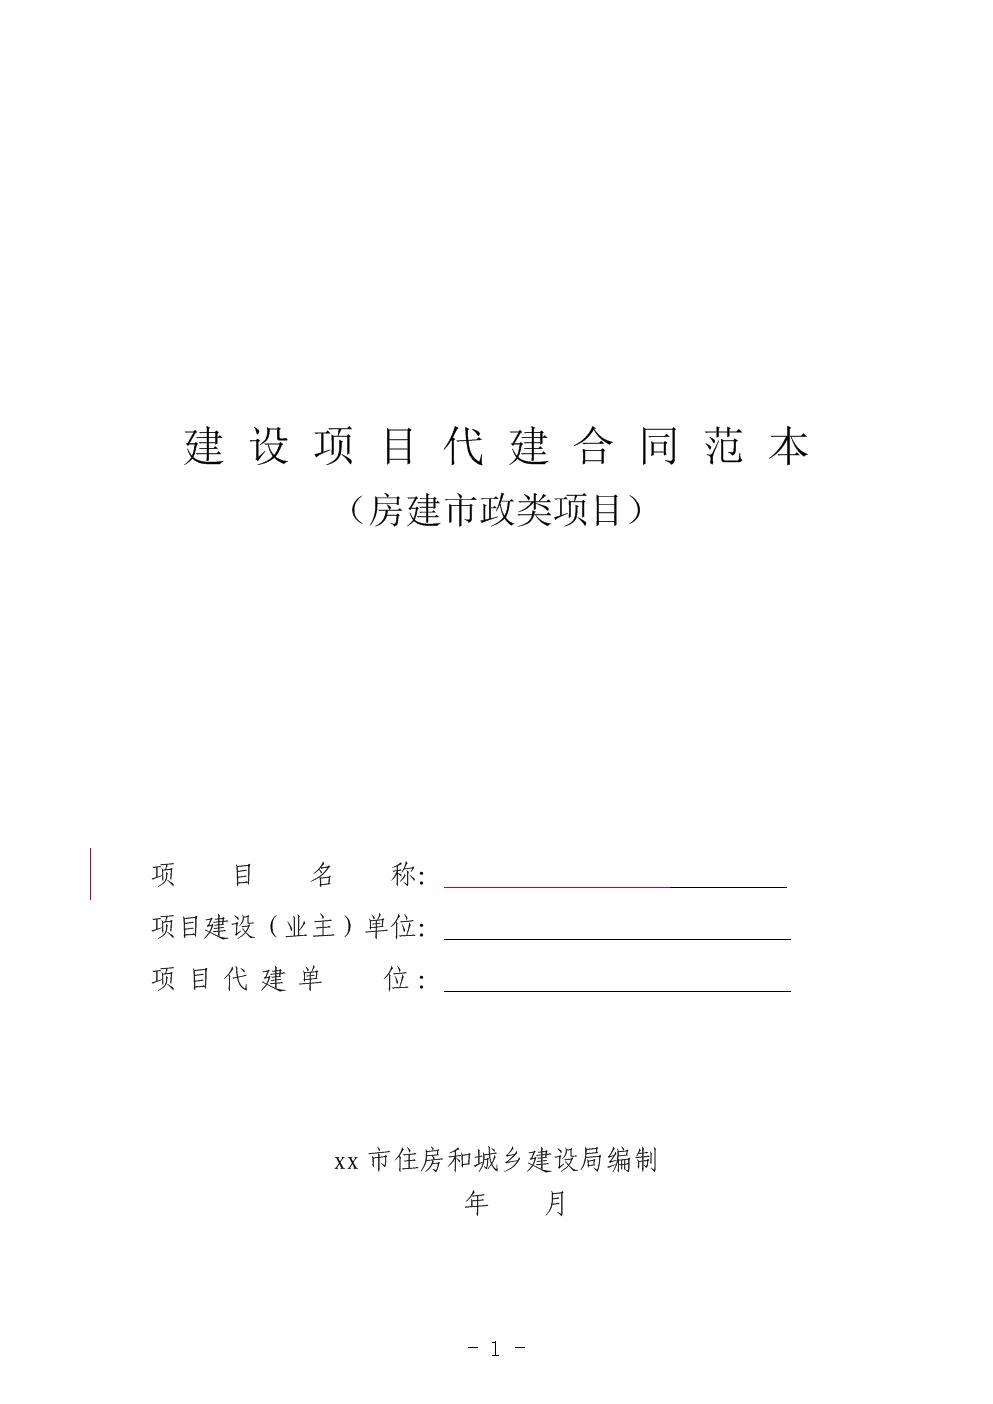 xx工程代建合同.doc